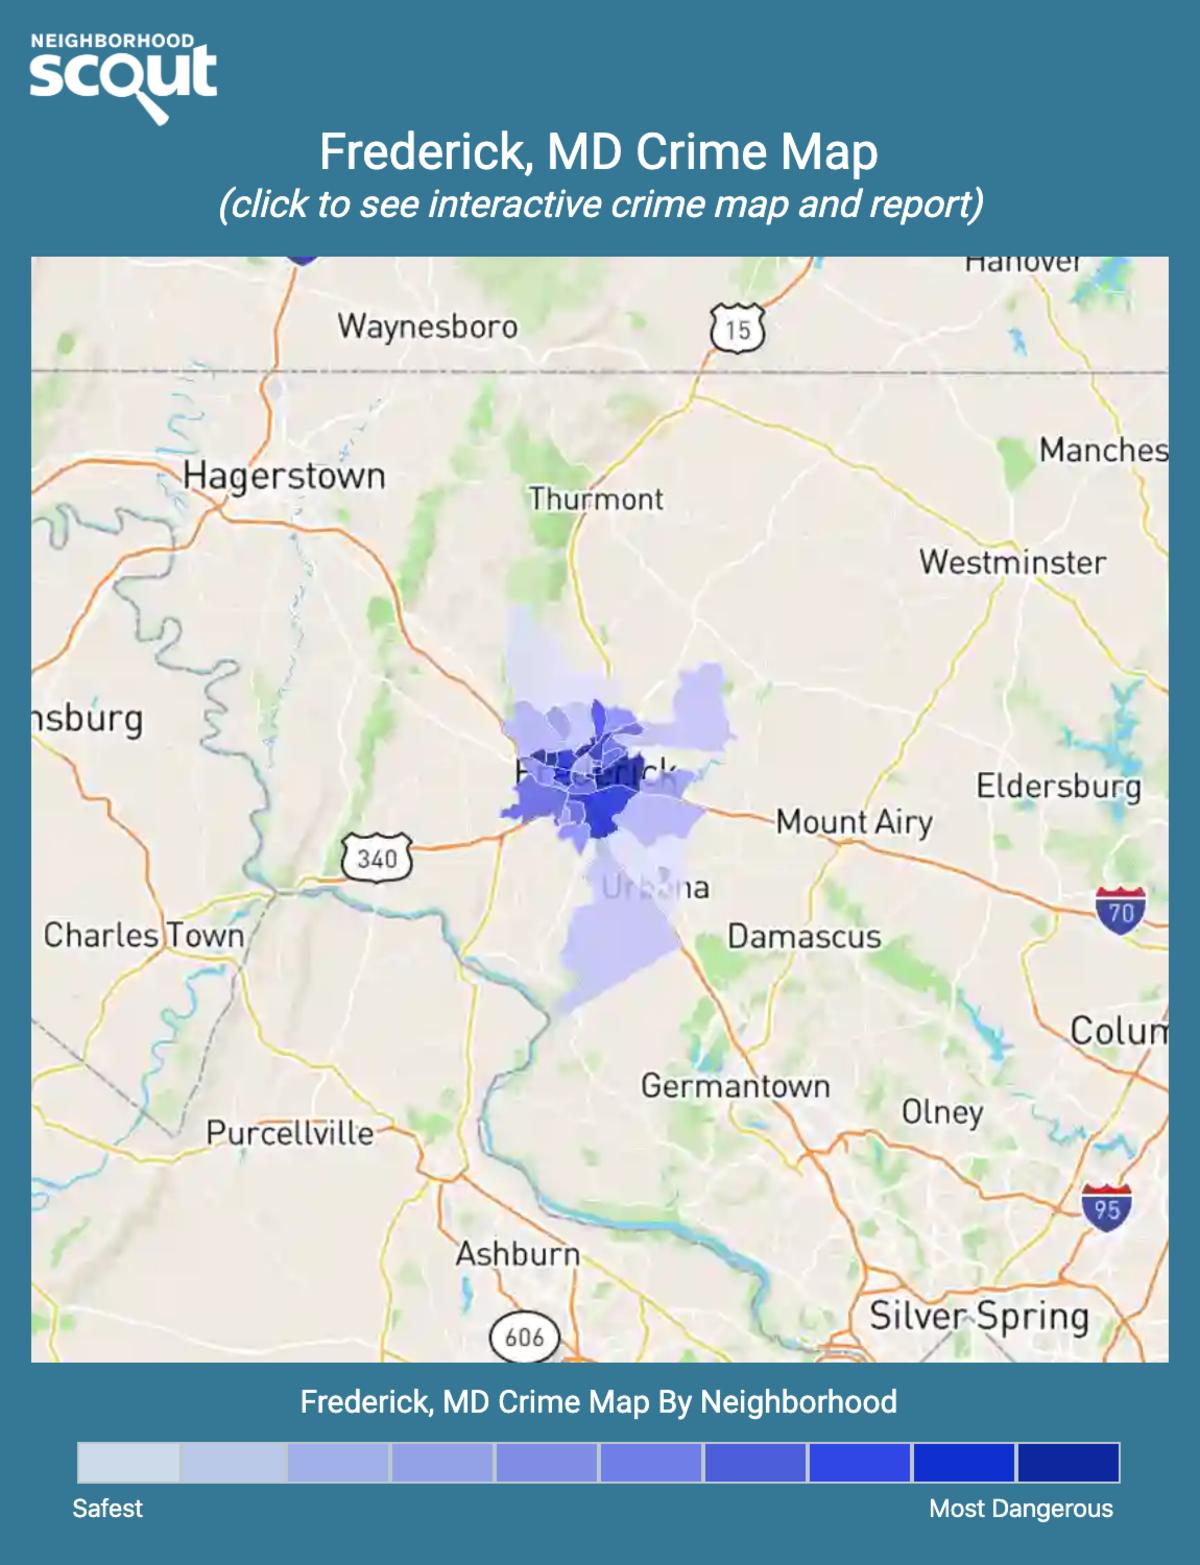 Frederick, Maryland crime map